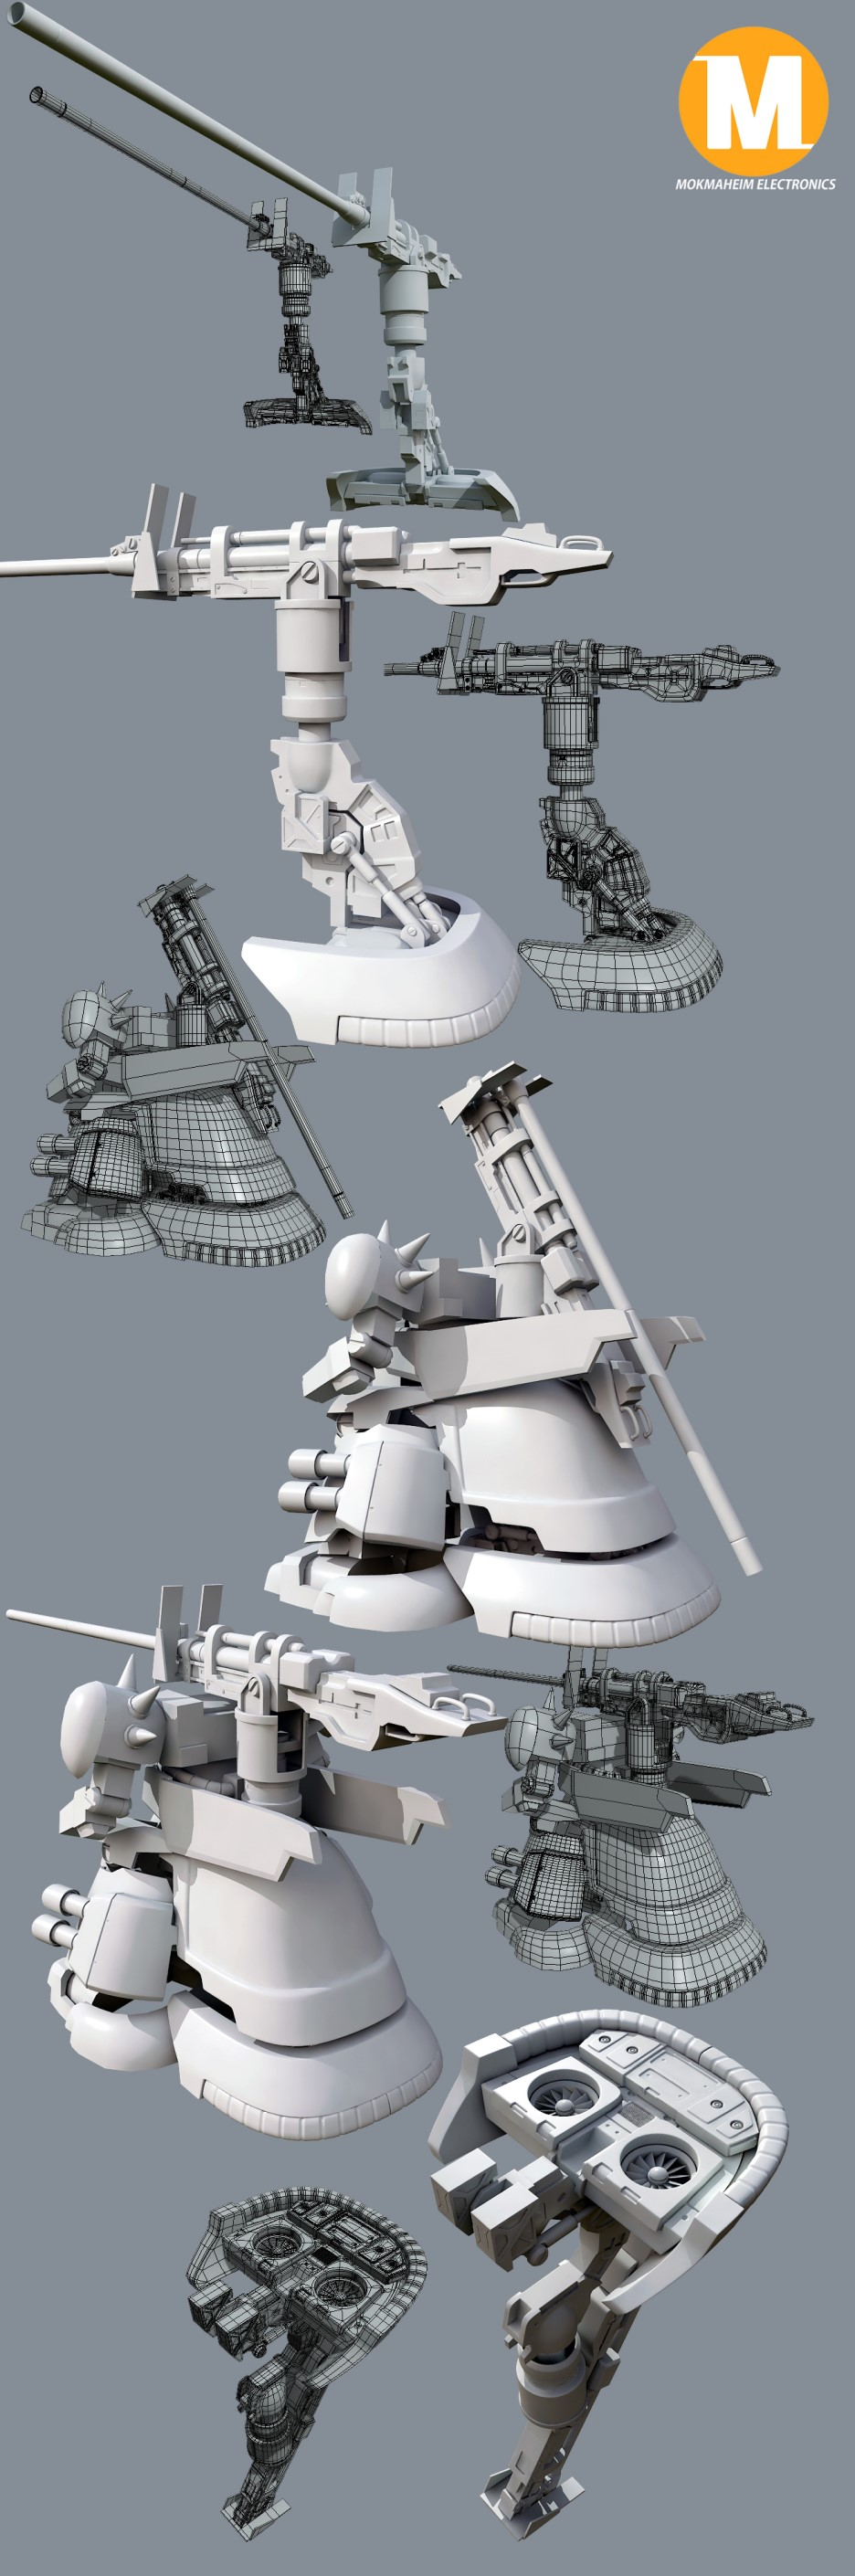 YMS-16M XAMEL(쟈멜) #2 680mm 캐논 : 네이버 블로그 | Zeon Loyalist ...